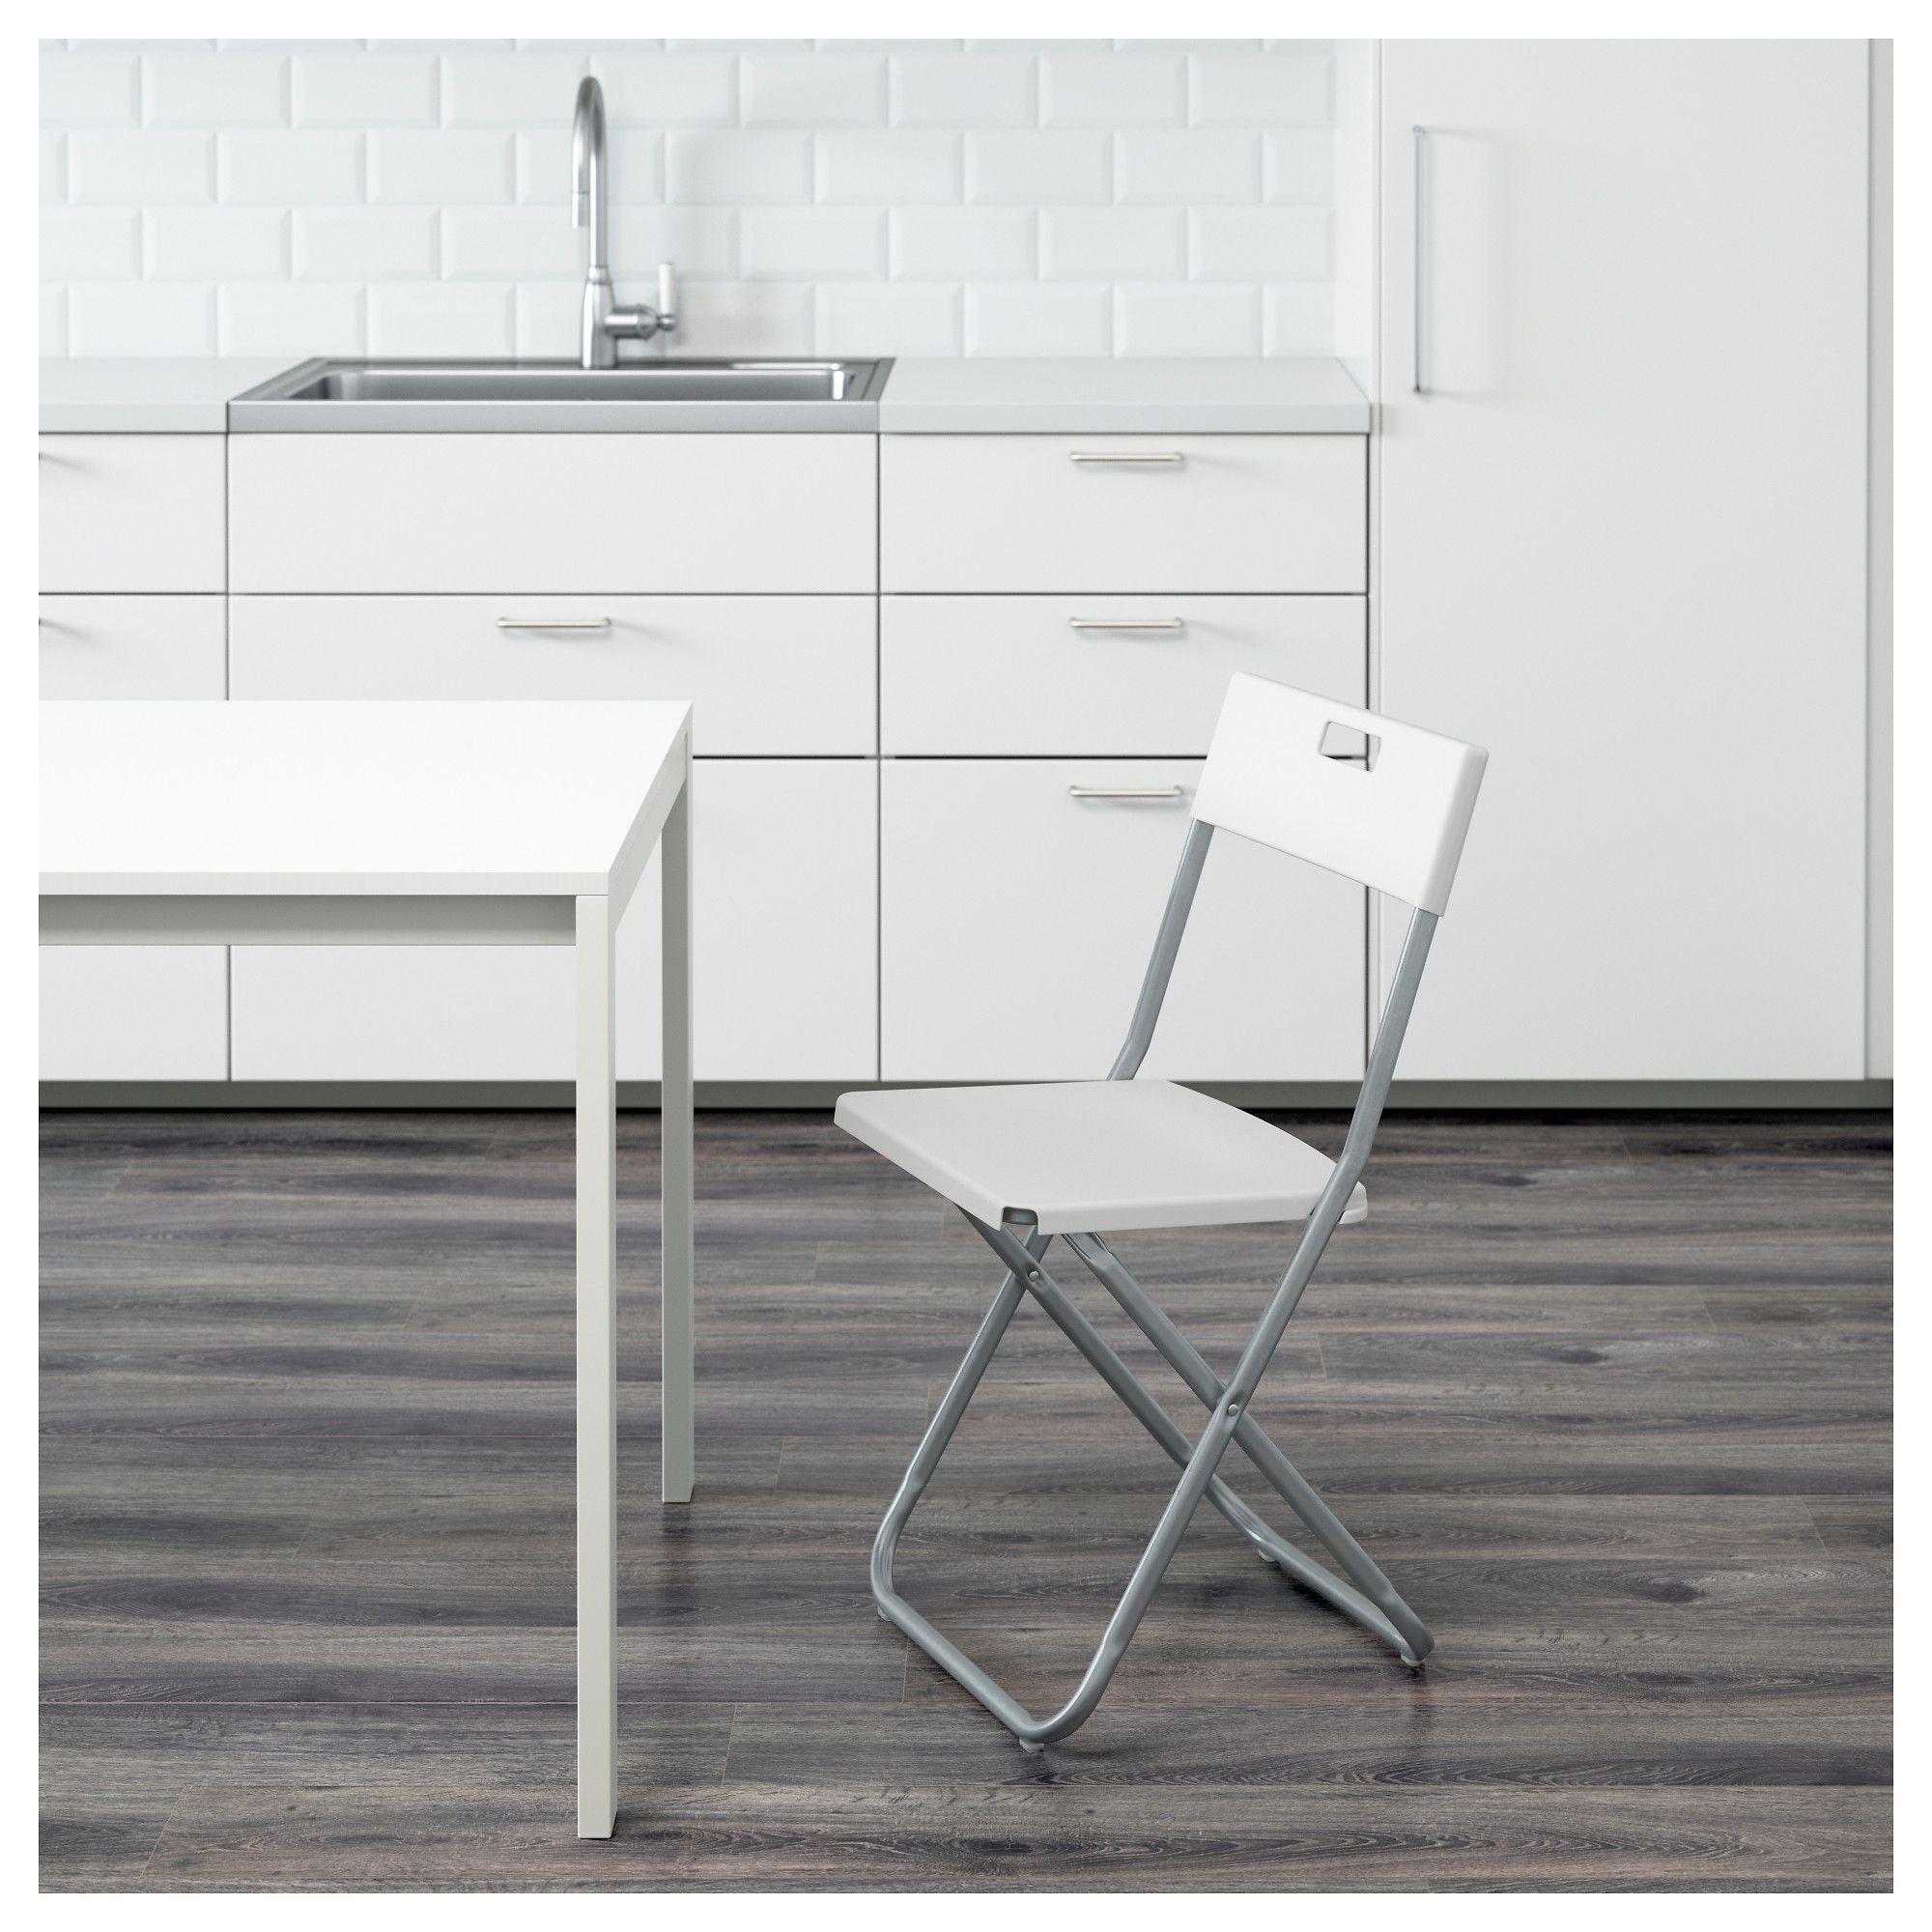 Gunde Folding Chair White Folding Chair Cheap Folding Chairs